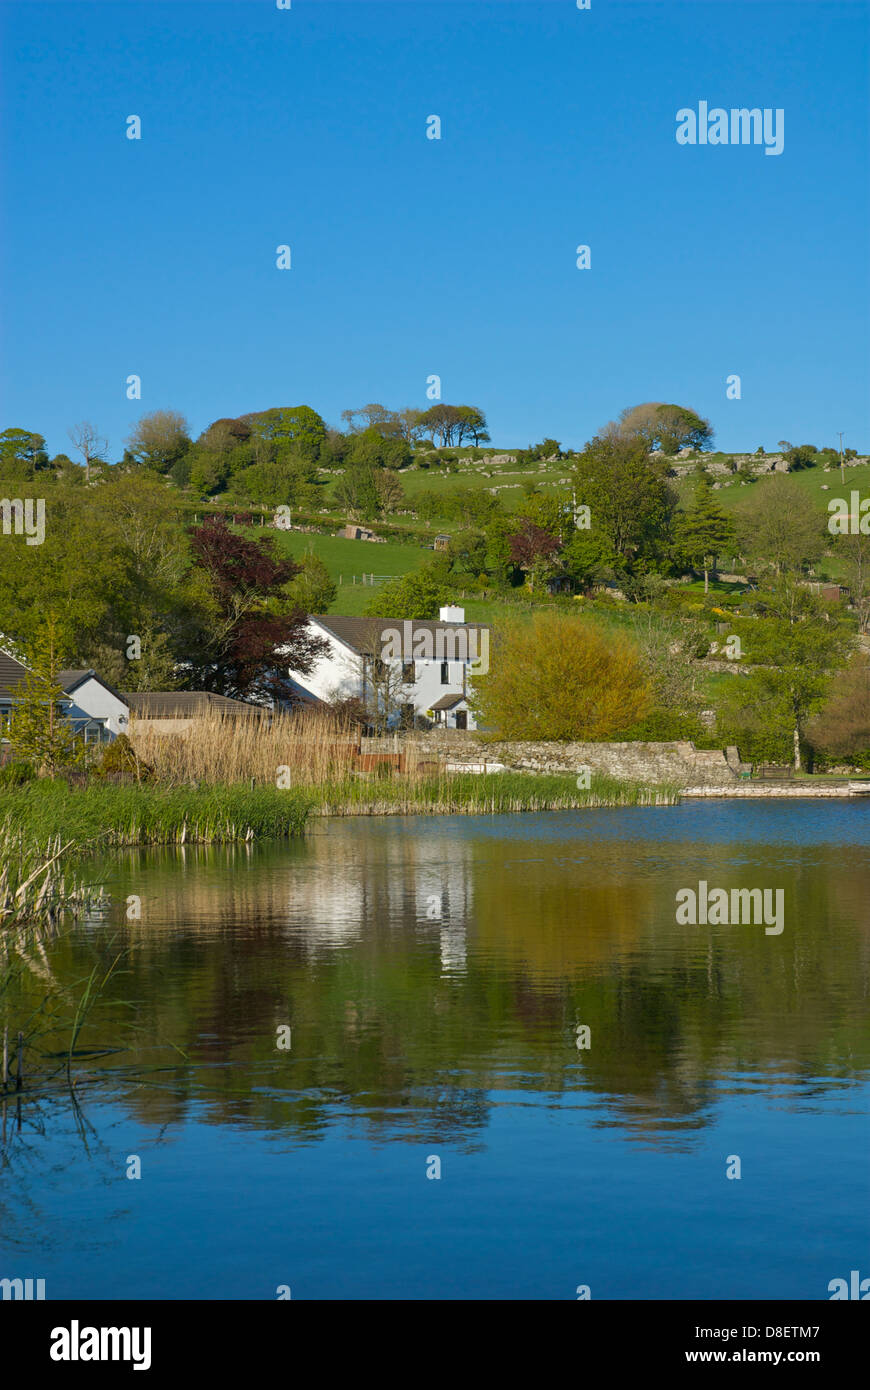 Great Urswick village and tarn, Cumbria, England UK - Stock Image